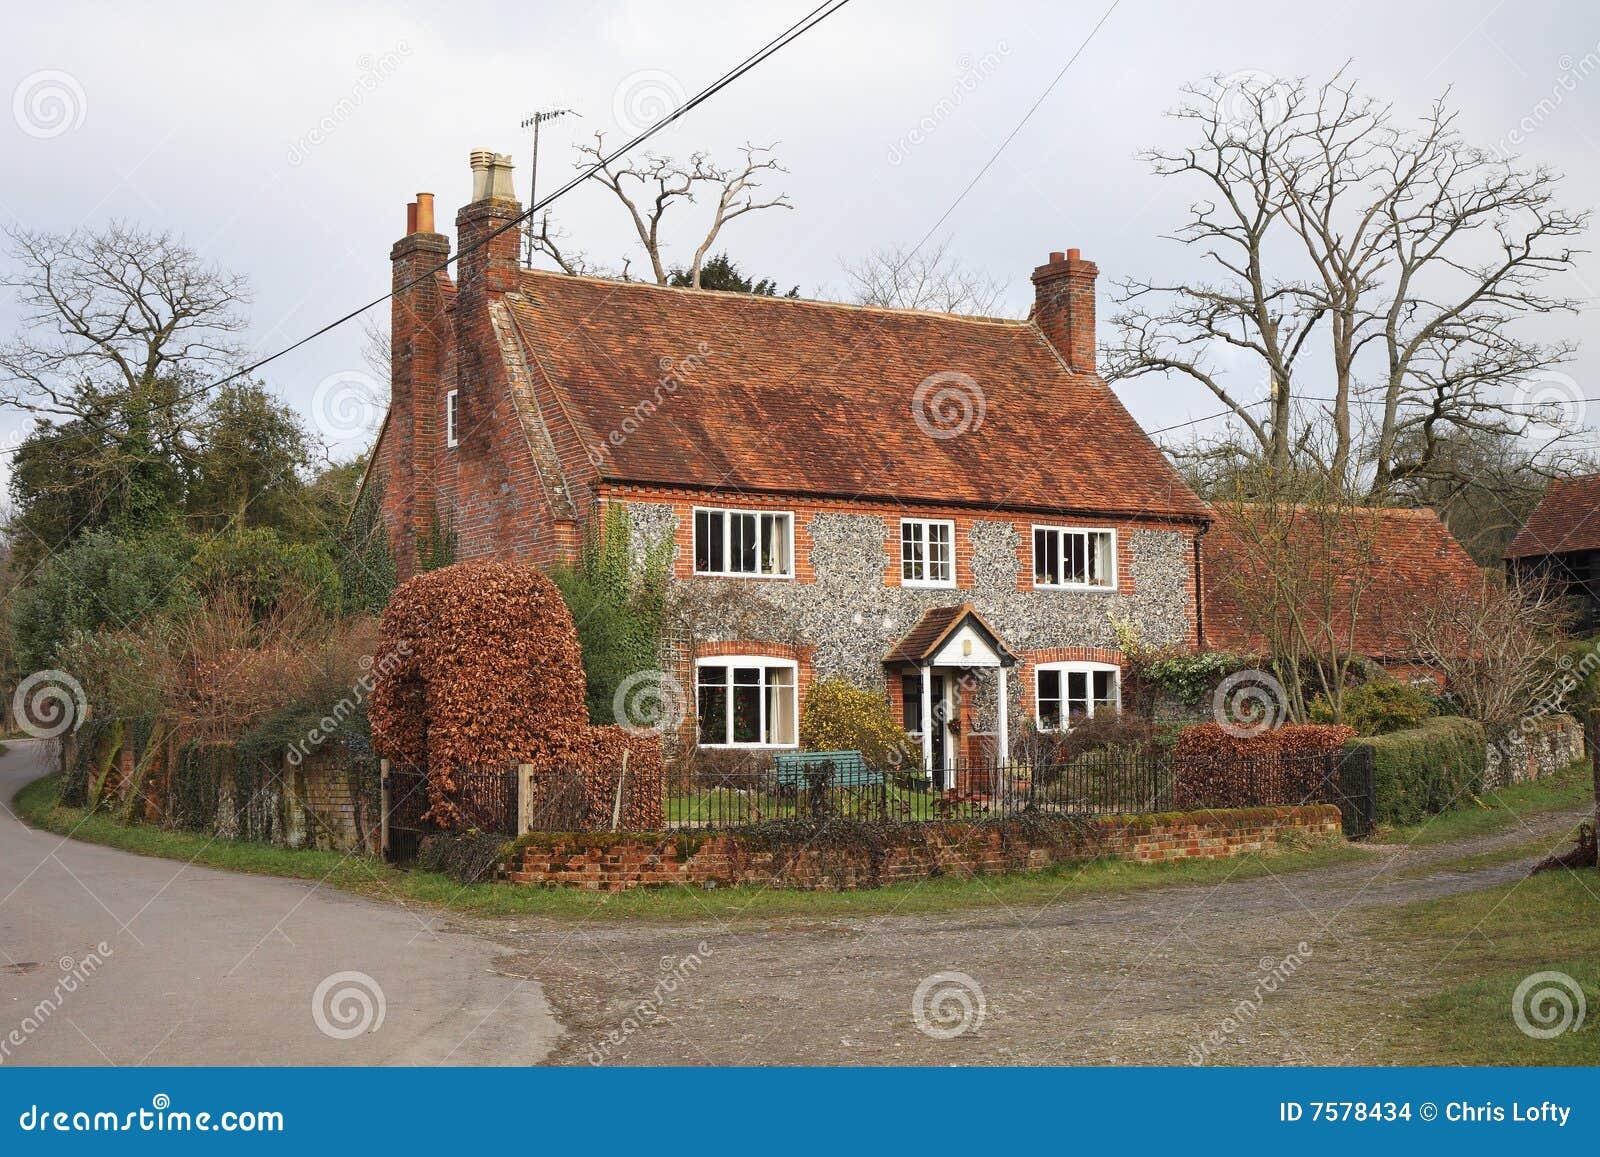 Traditional Brick And Flint English Farmhouse Stock Image